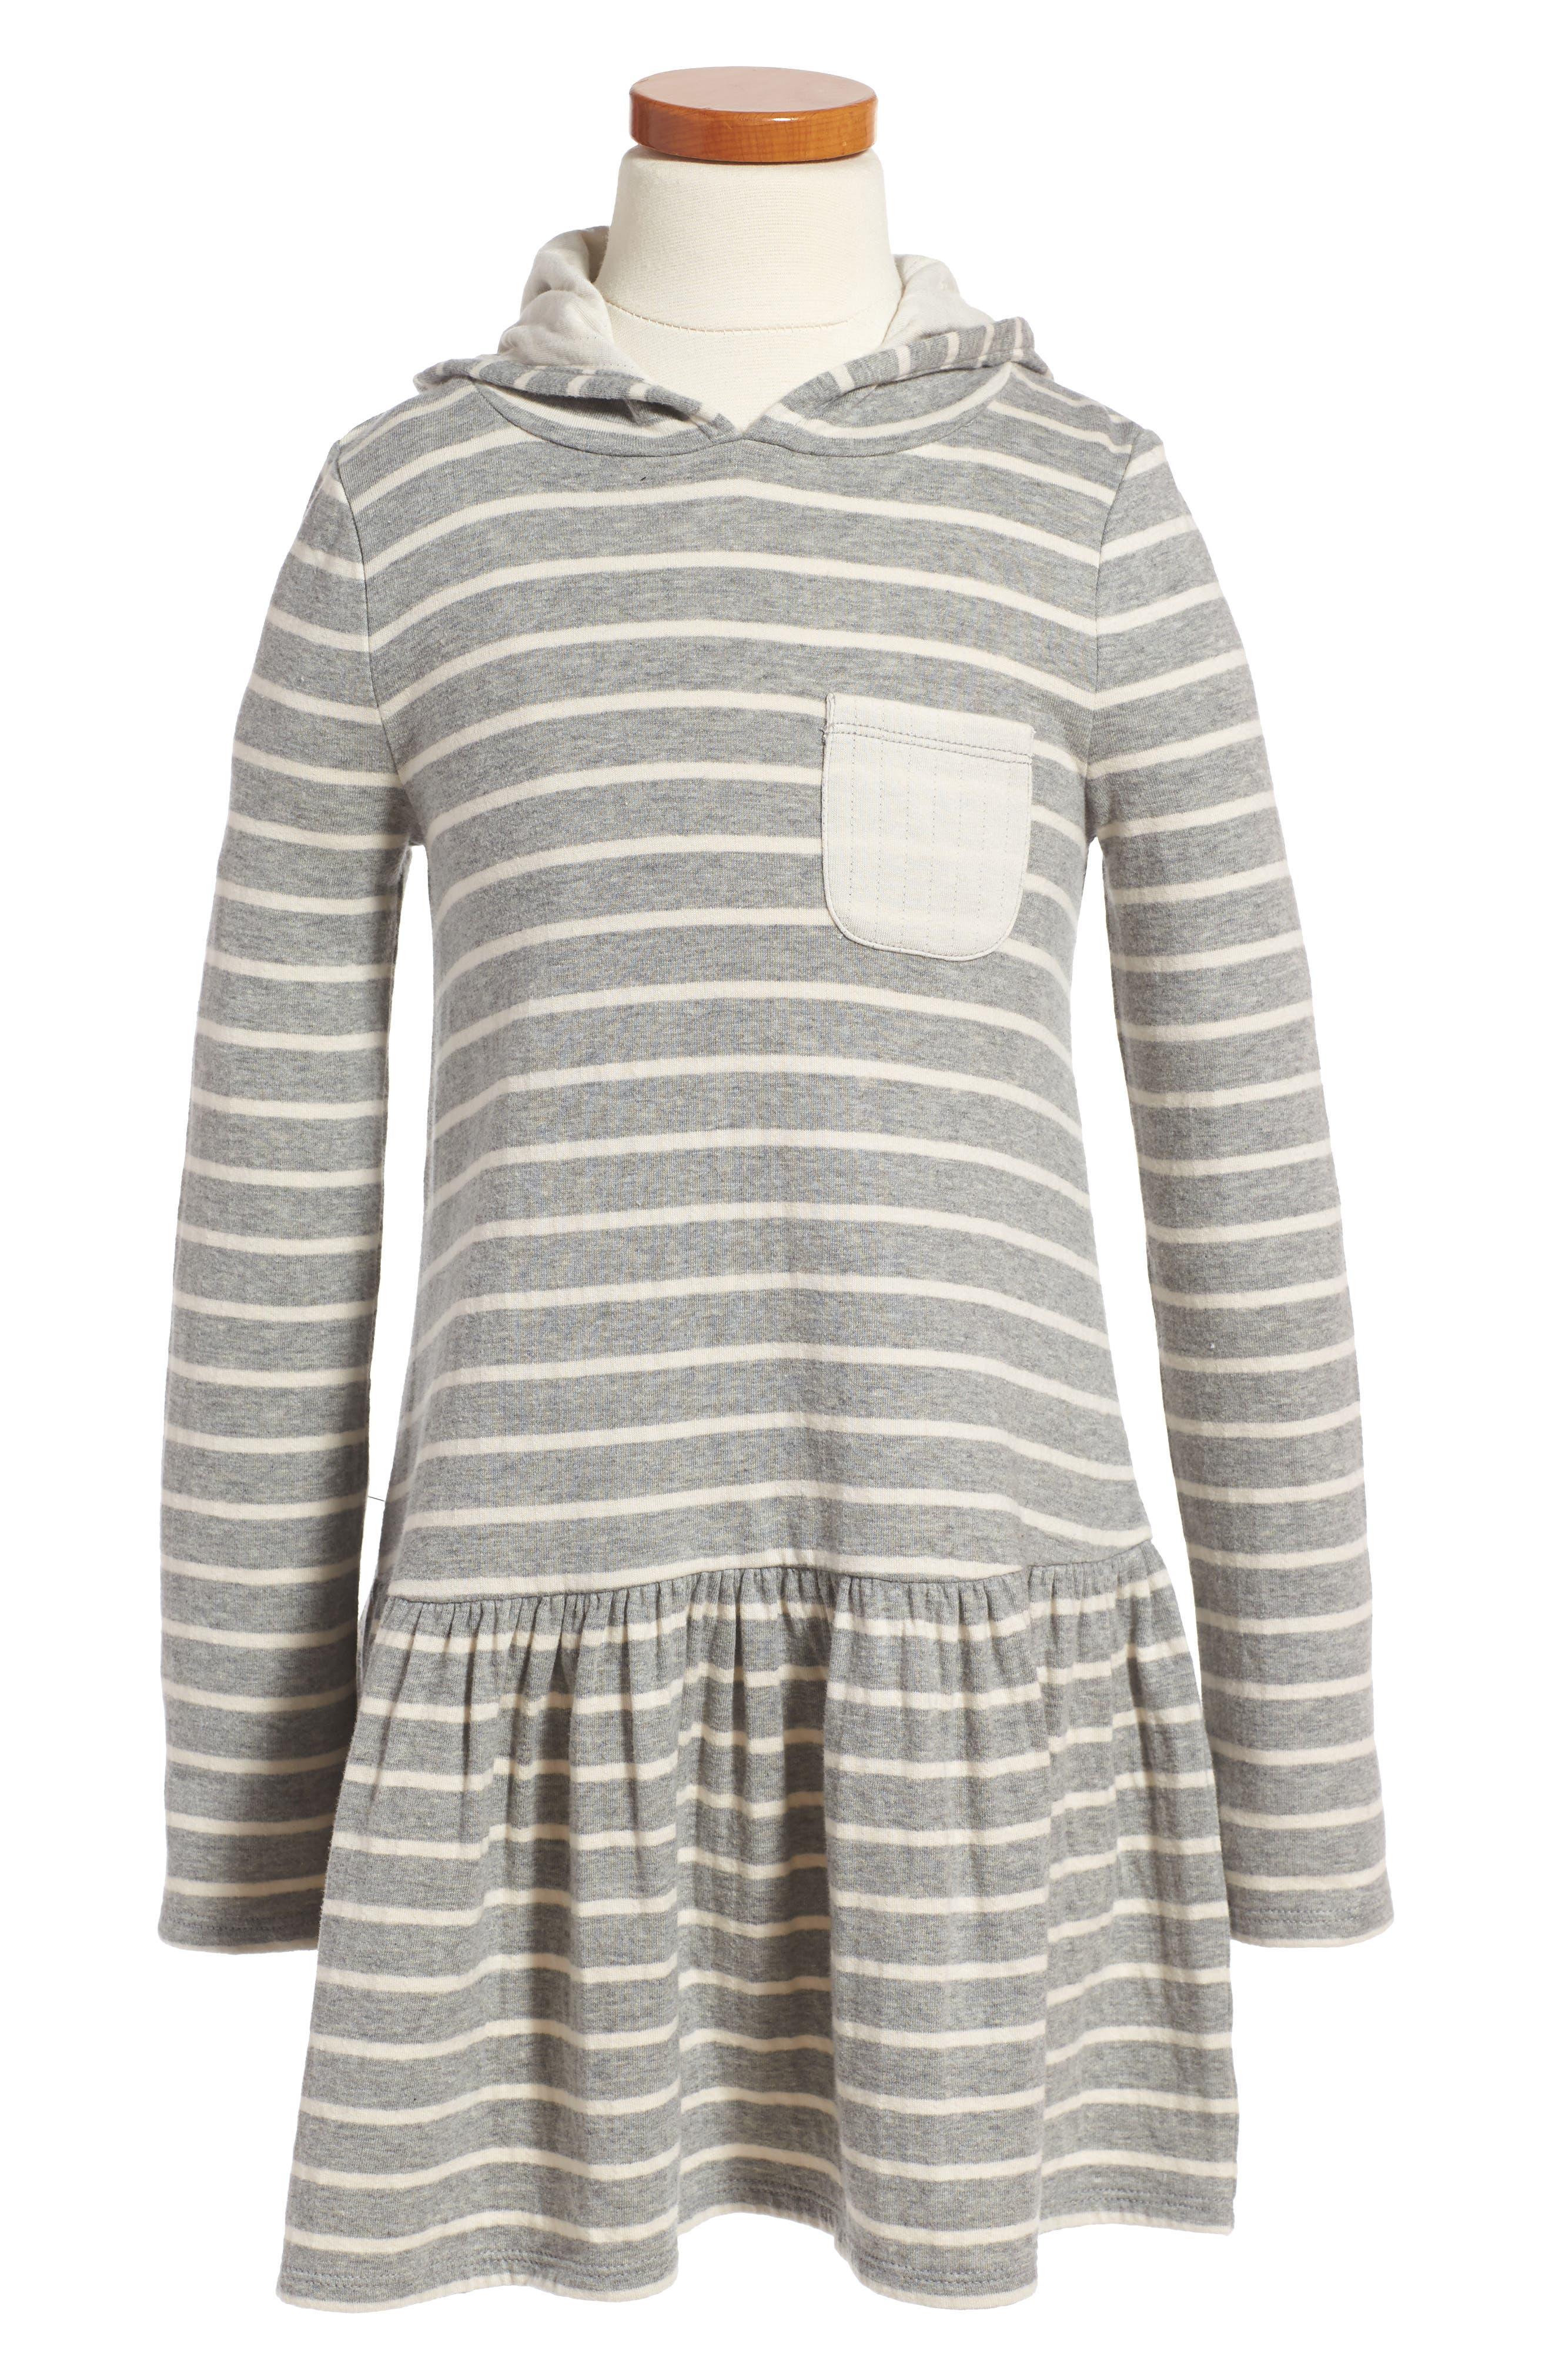 Alternate Image 1 Selected - Tucker + Tate Stripe Hoodie Knit Dress (Toddler Girls, Little Girls & Big Girls)